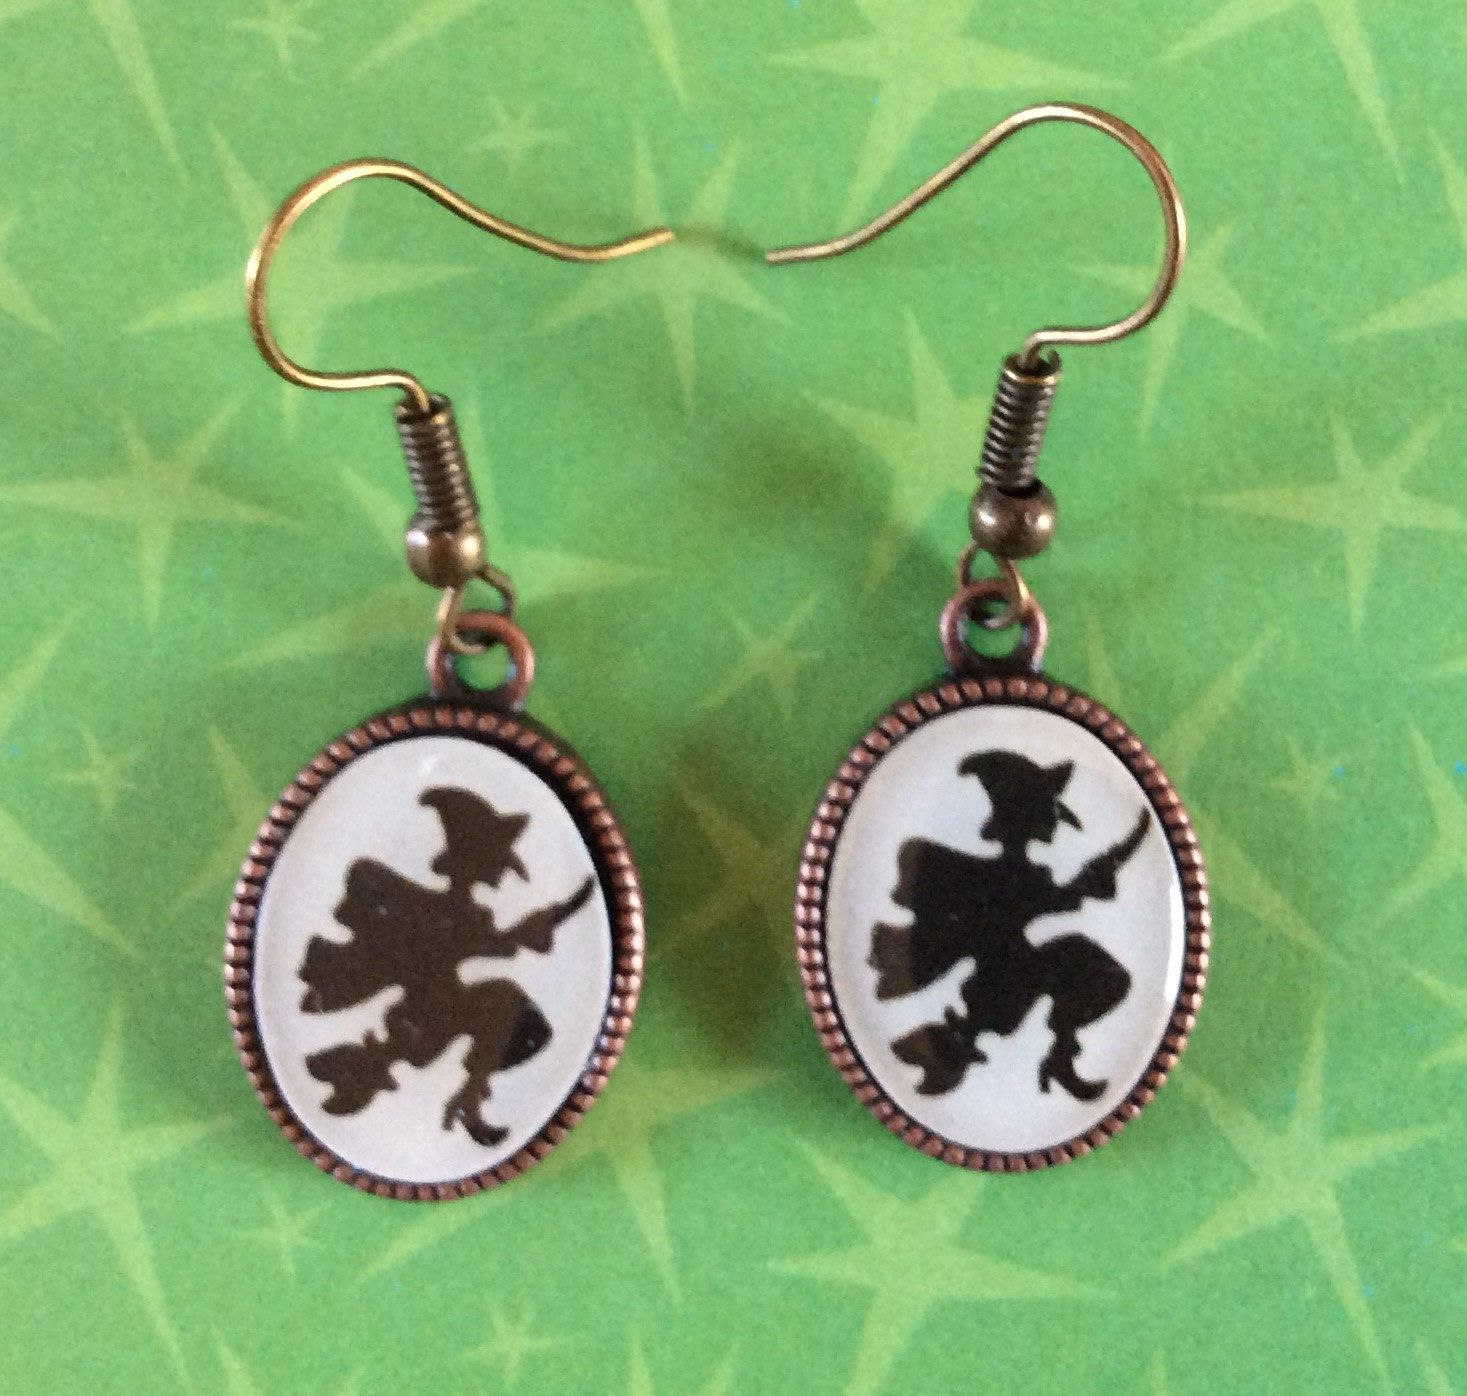 76d9c74e2 Witch earrings. Striped knee high socks. Witch shoe earrings. Witches hat  earrings. Witch socks. Witch shoe earrings. Wicked witch socks